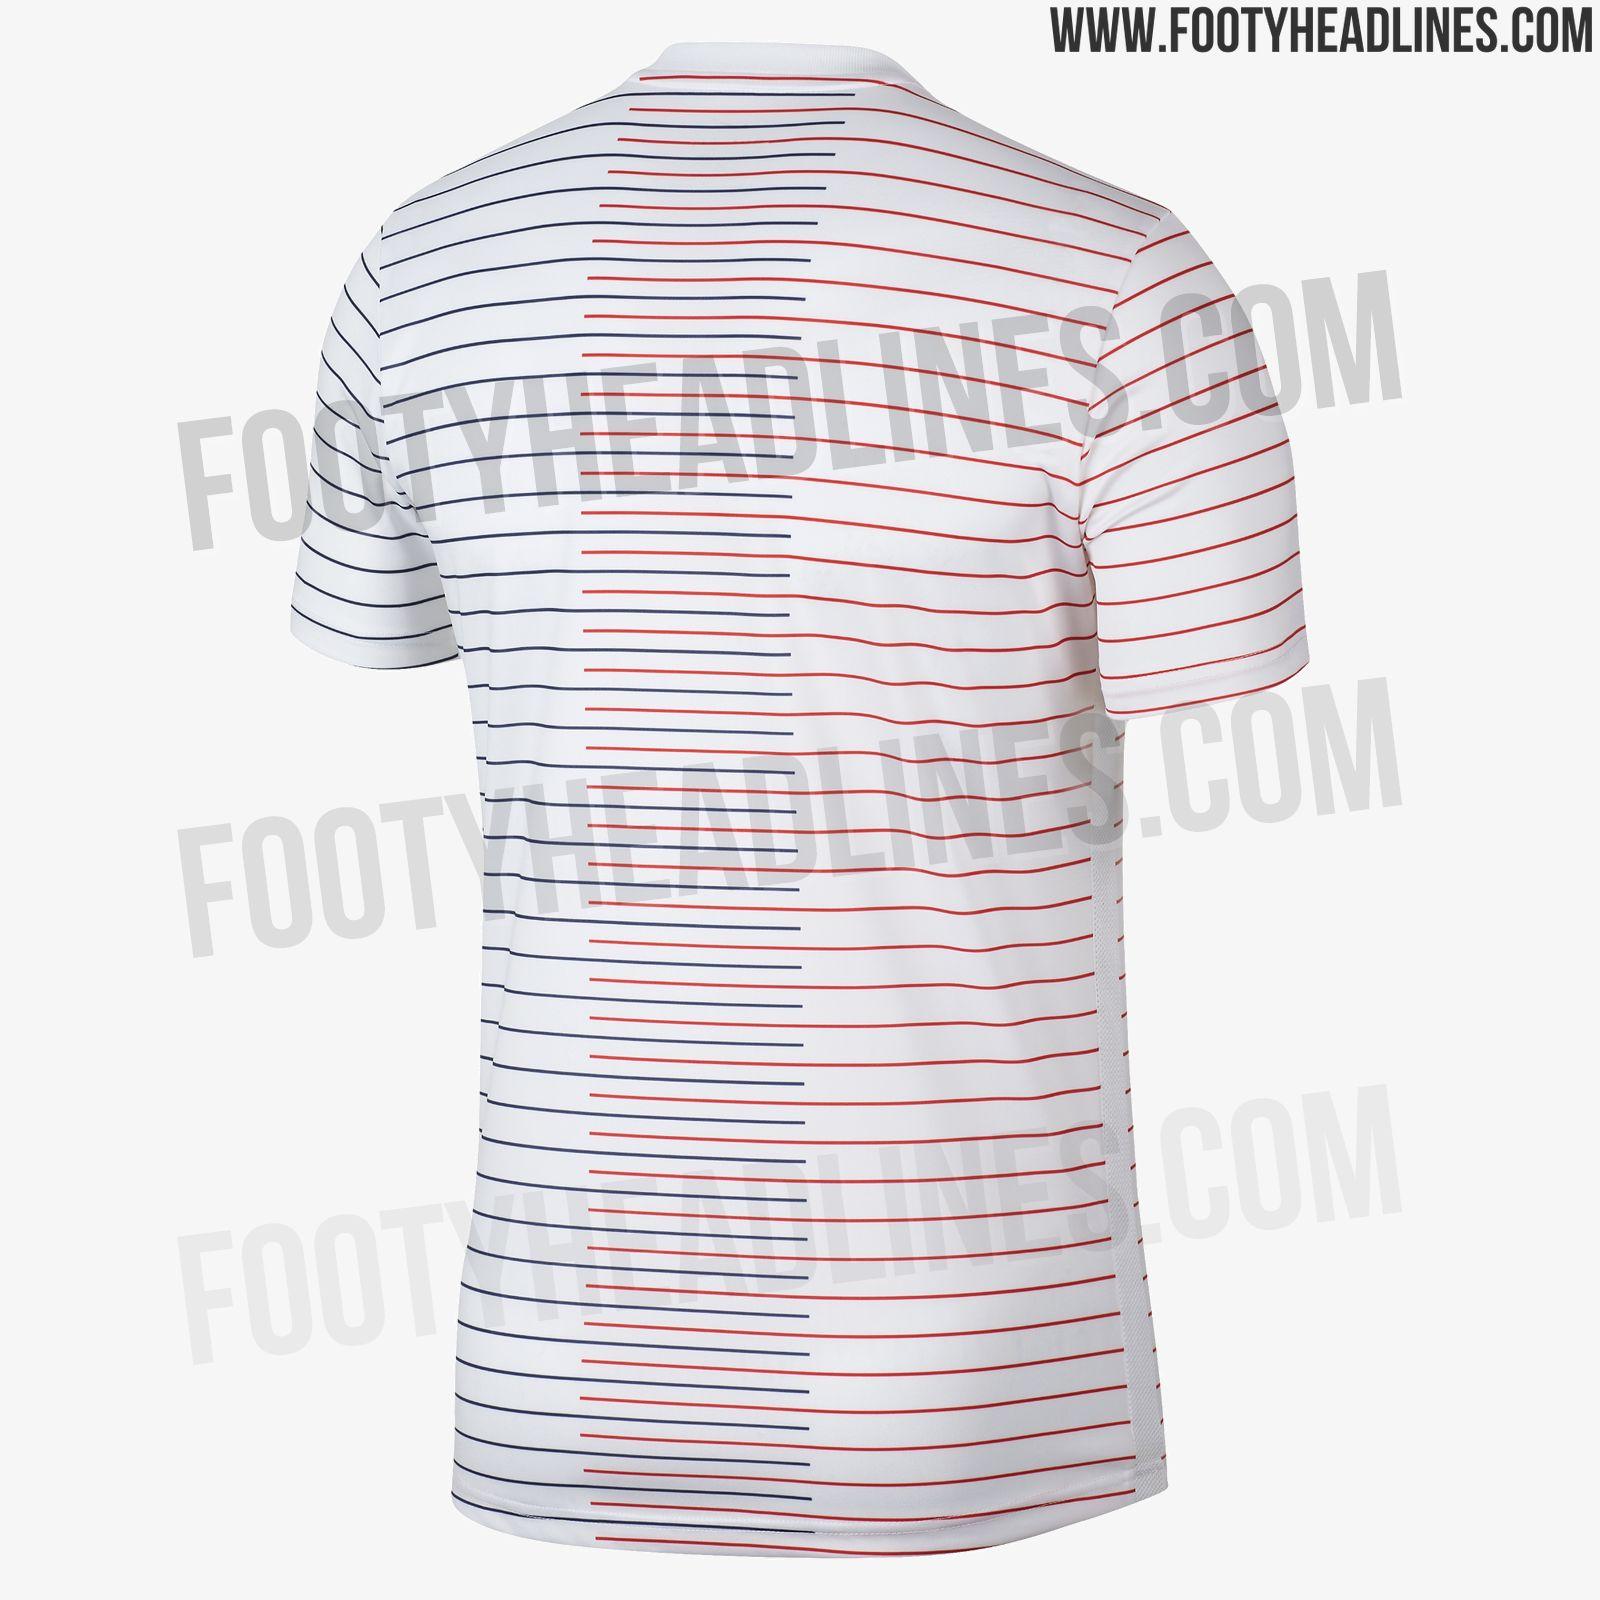 Nike PSG 19-20 Pre-Match Shirt Leaked